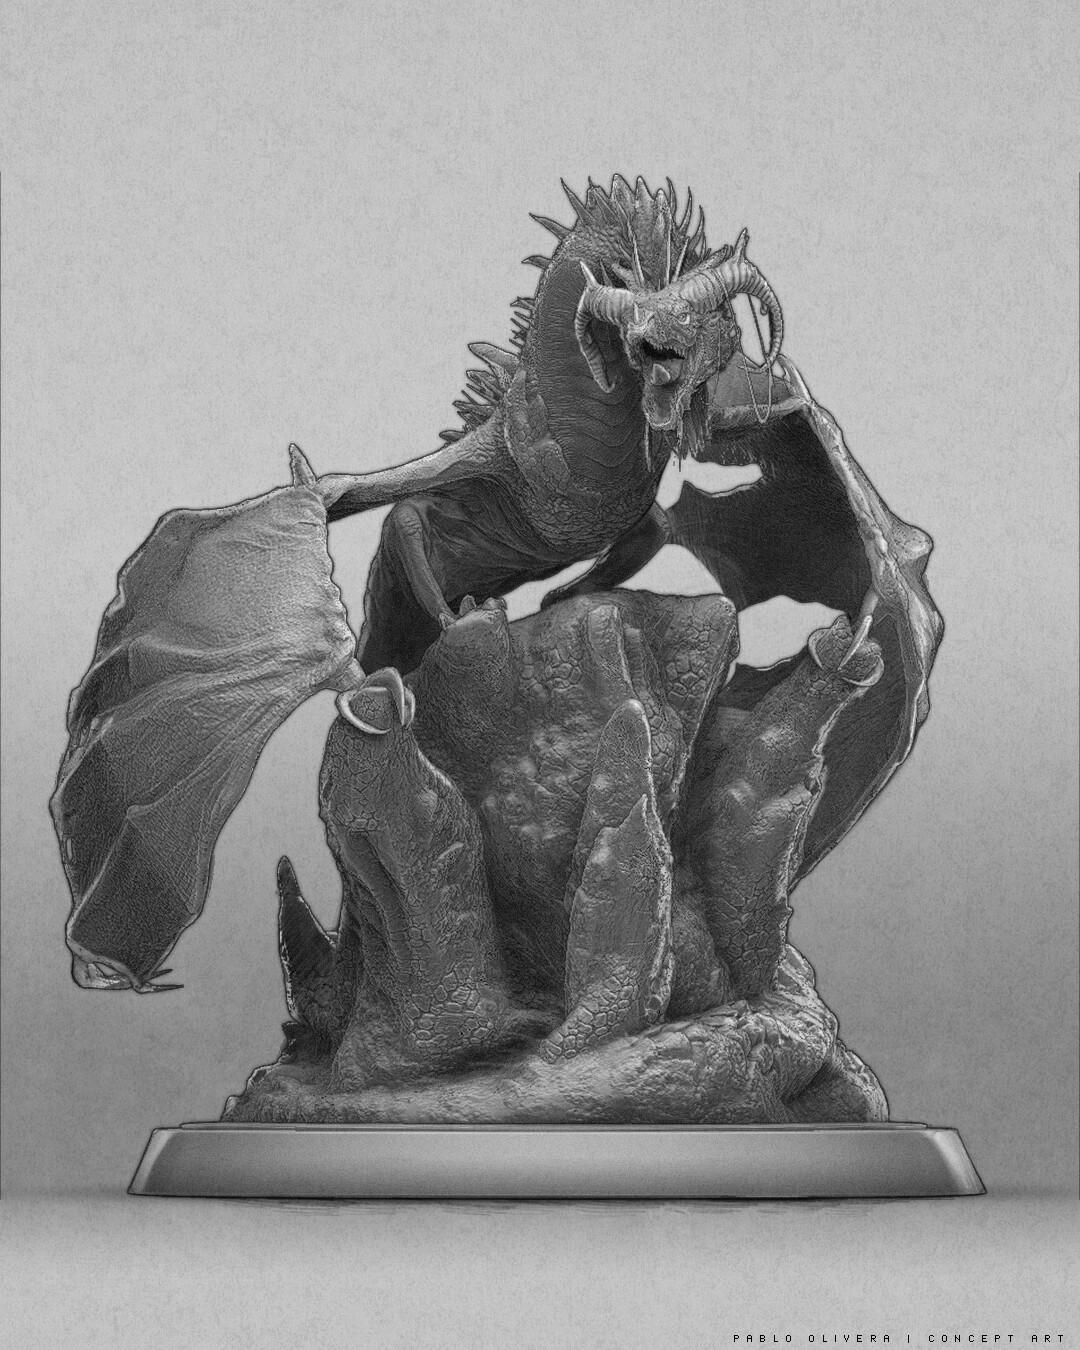 Pablo olivera dragon v01 draw